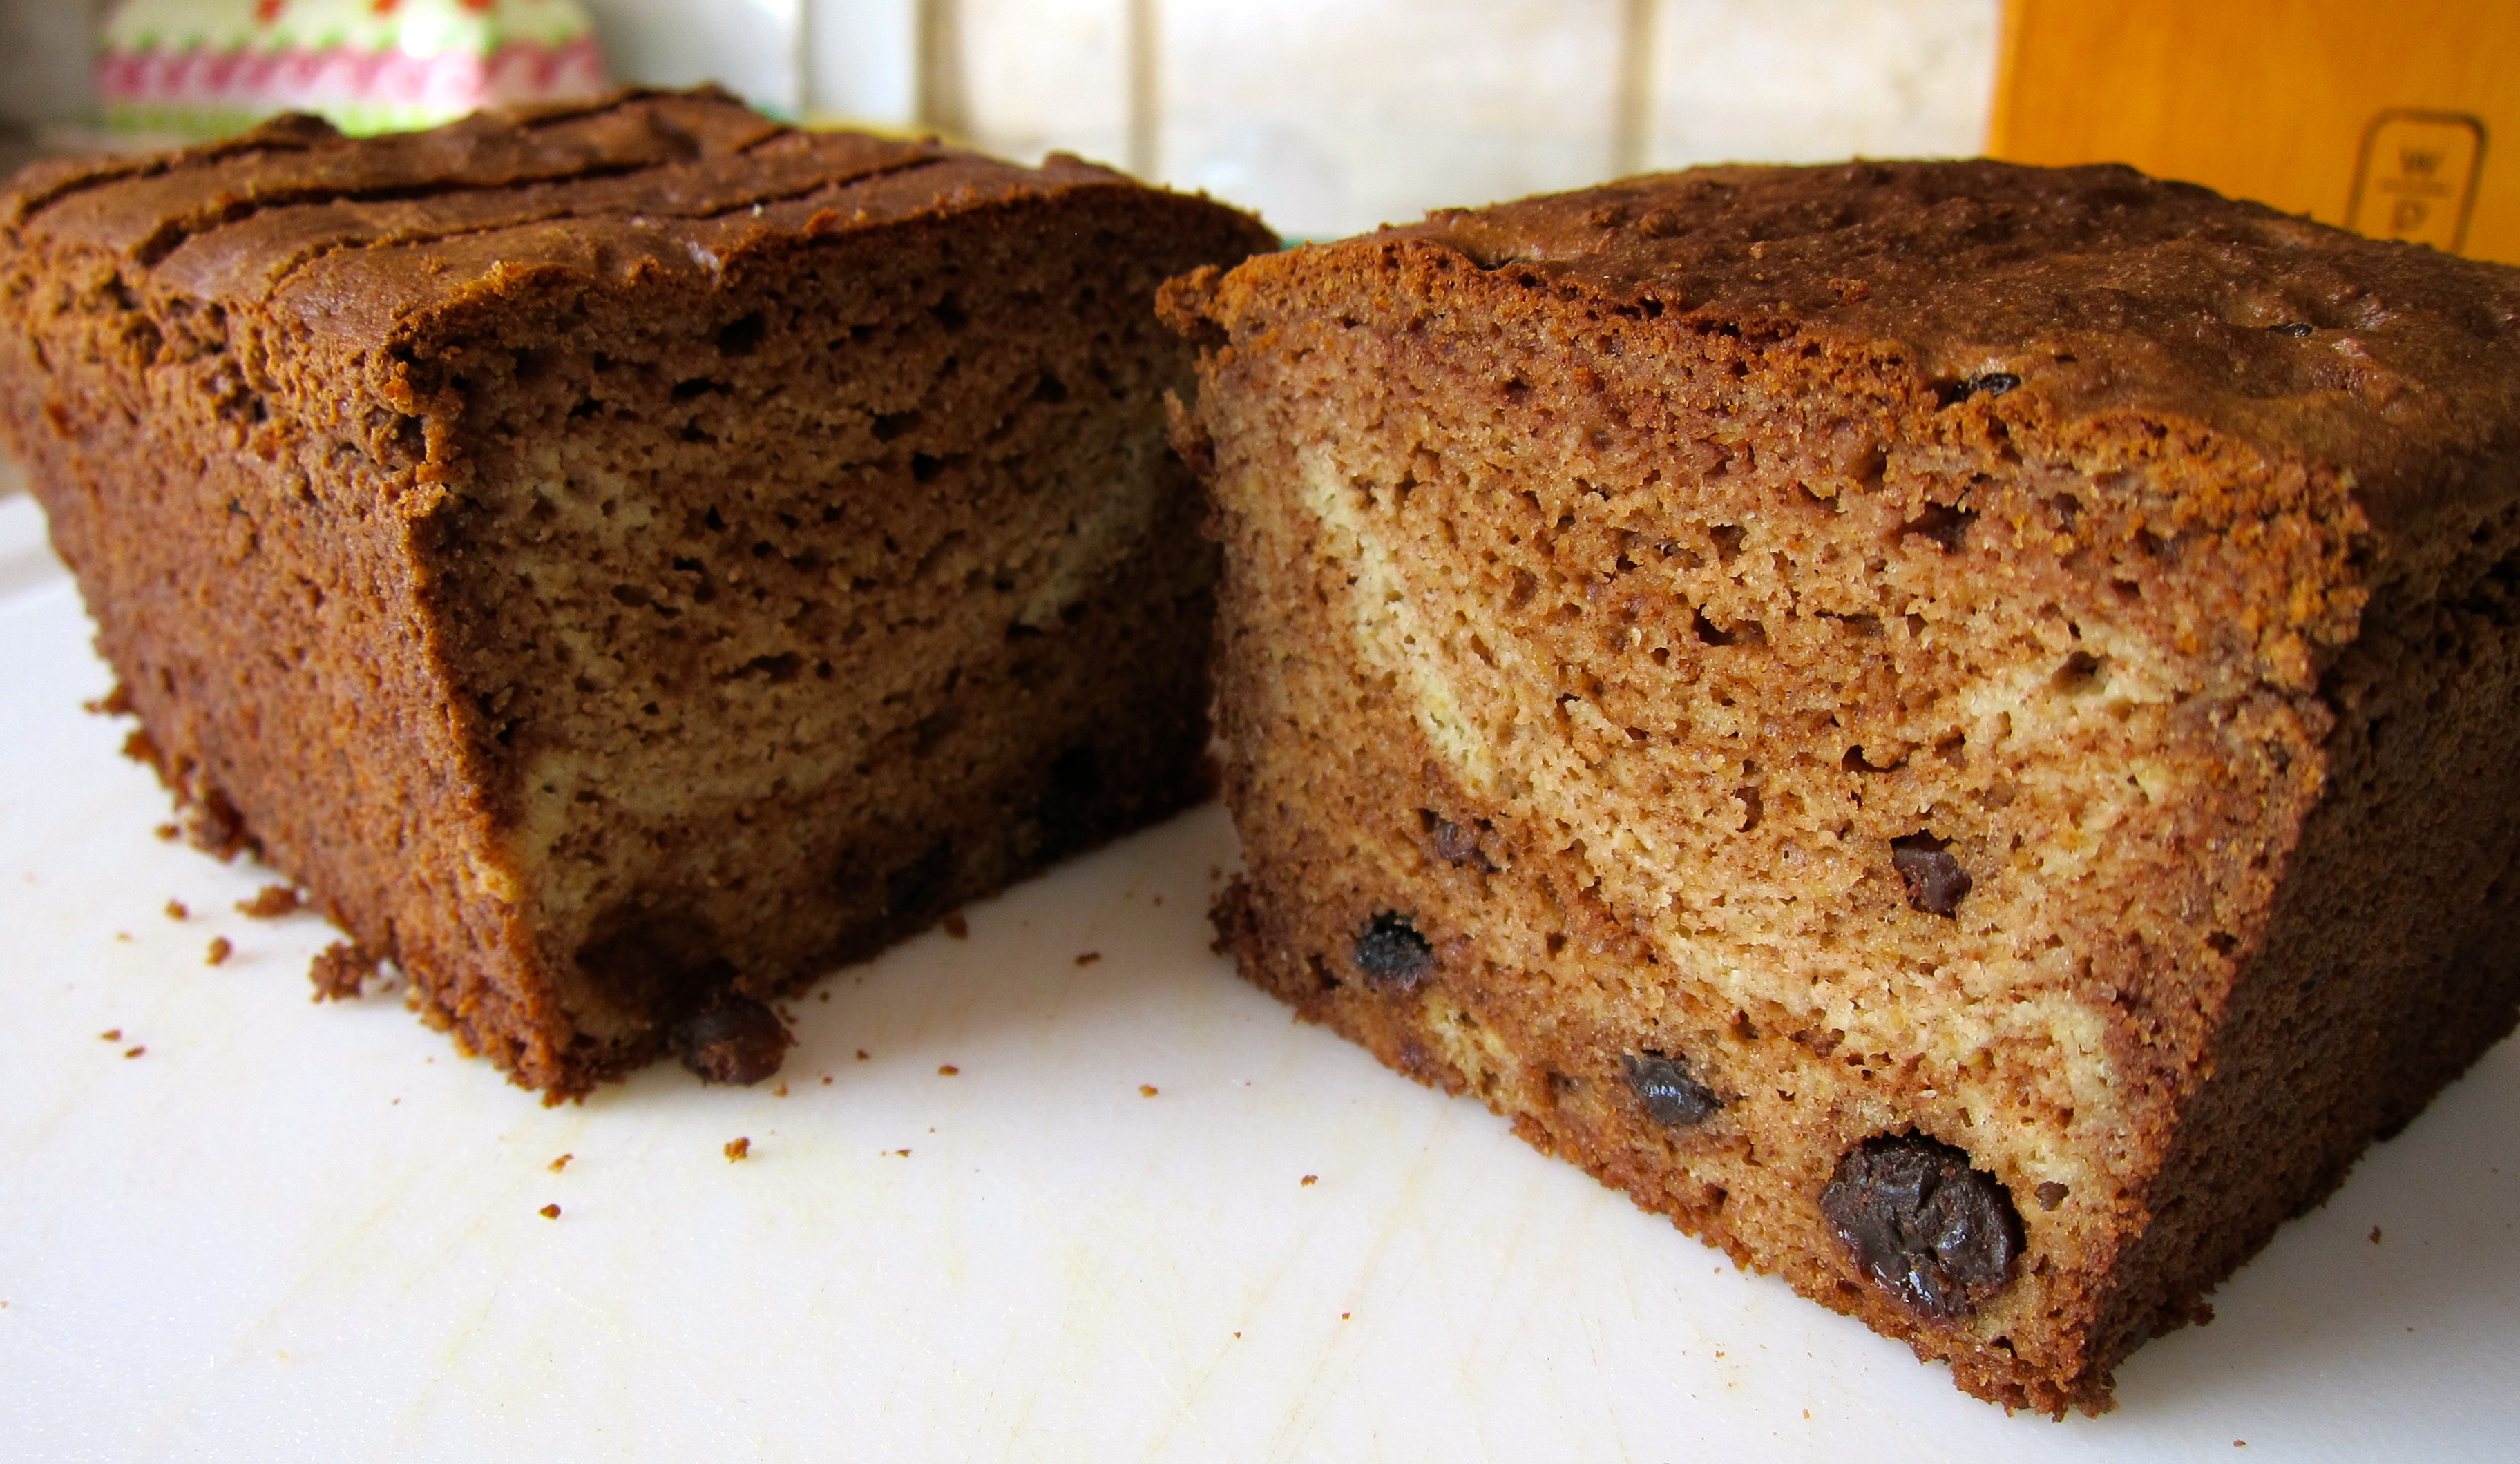 Healthy Cinnamon Raisin Bread  Cinnamon Swirl Raisin Bread – Simply Living Healthy